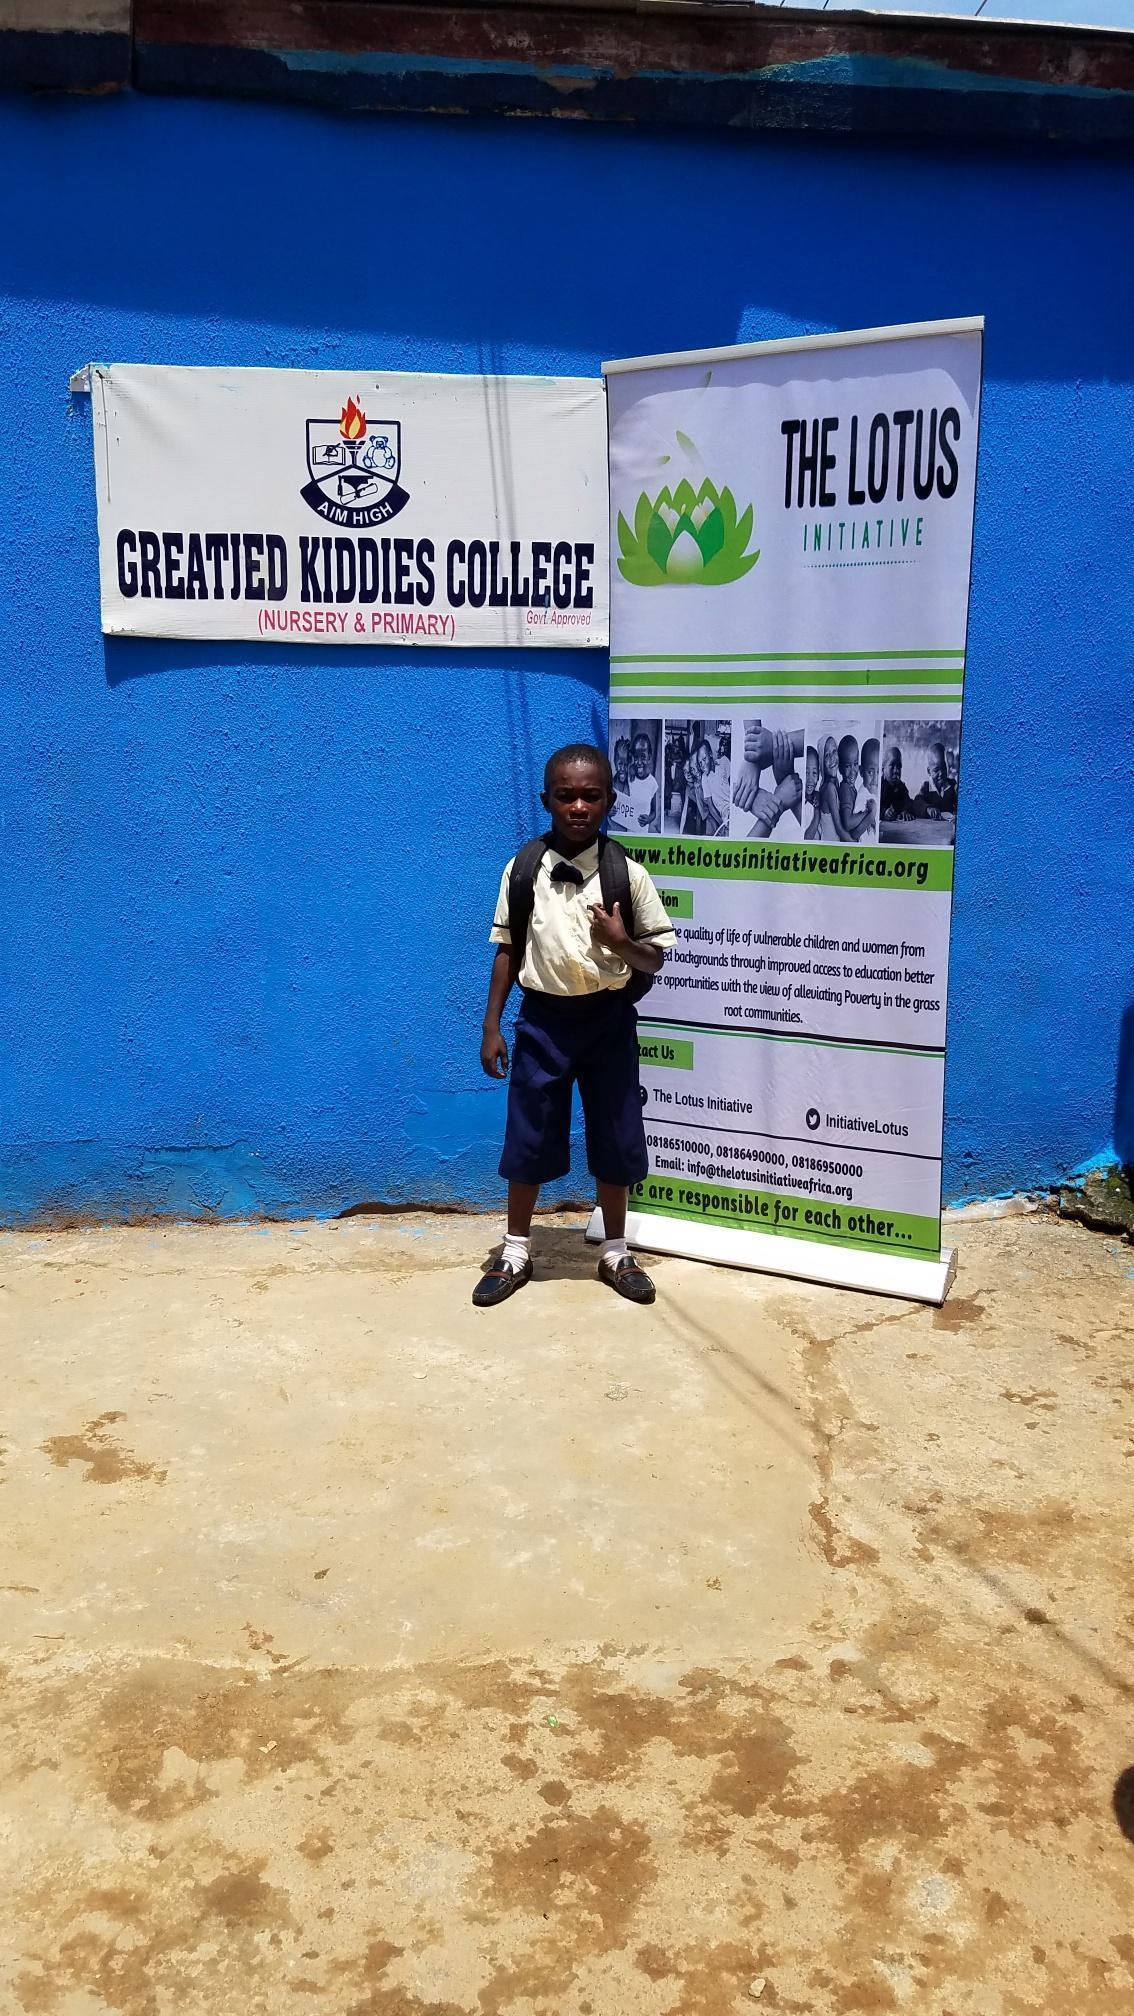 Lotus Scholar David Oyegoke of Greatied Kiddies College, Shasha, Lagos